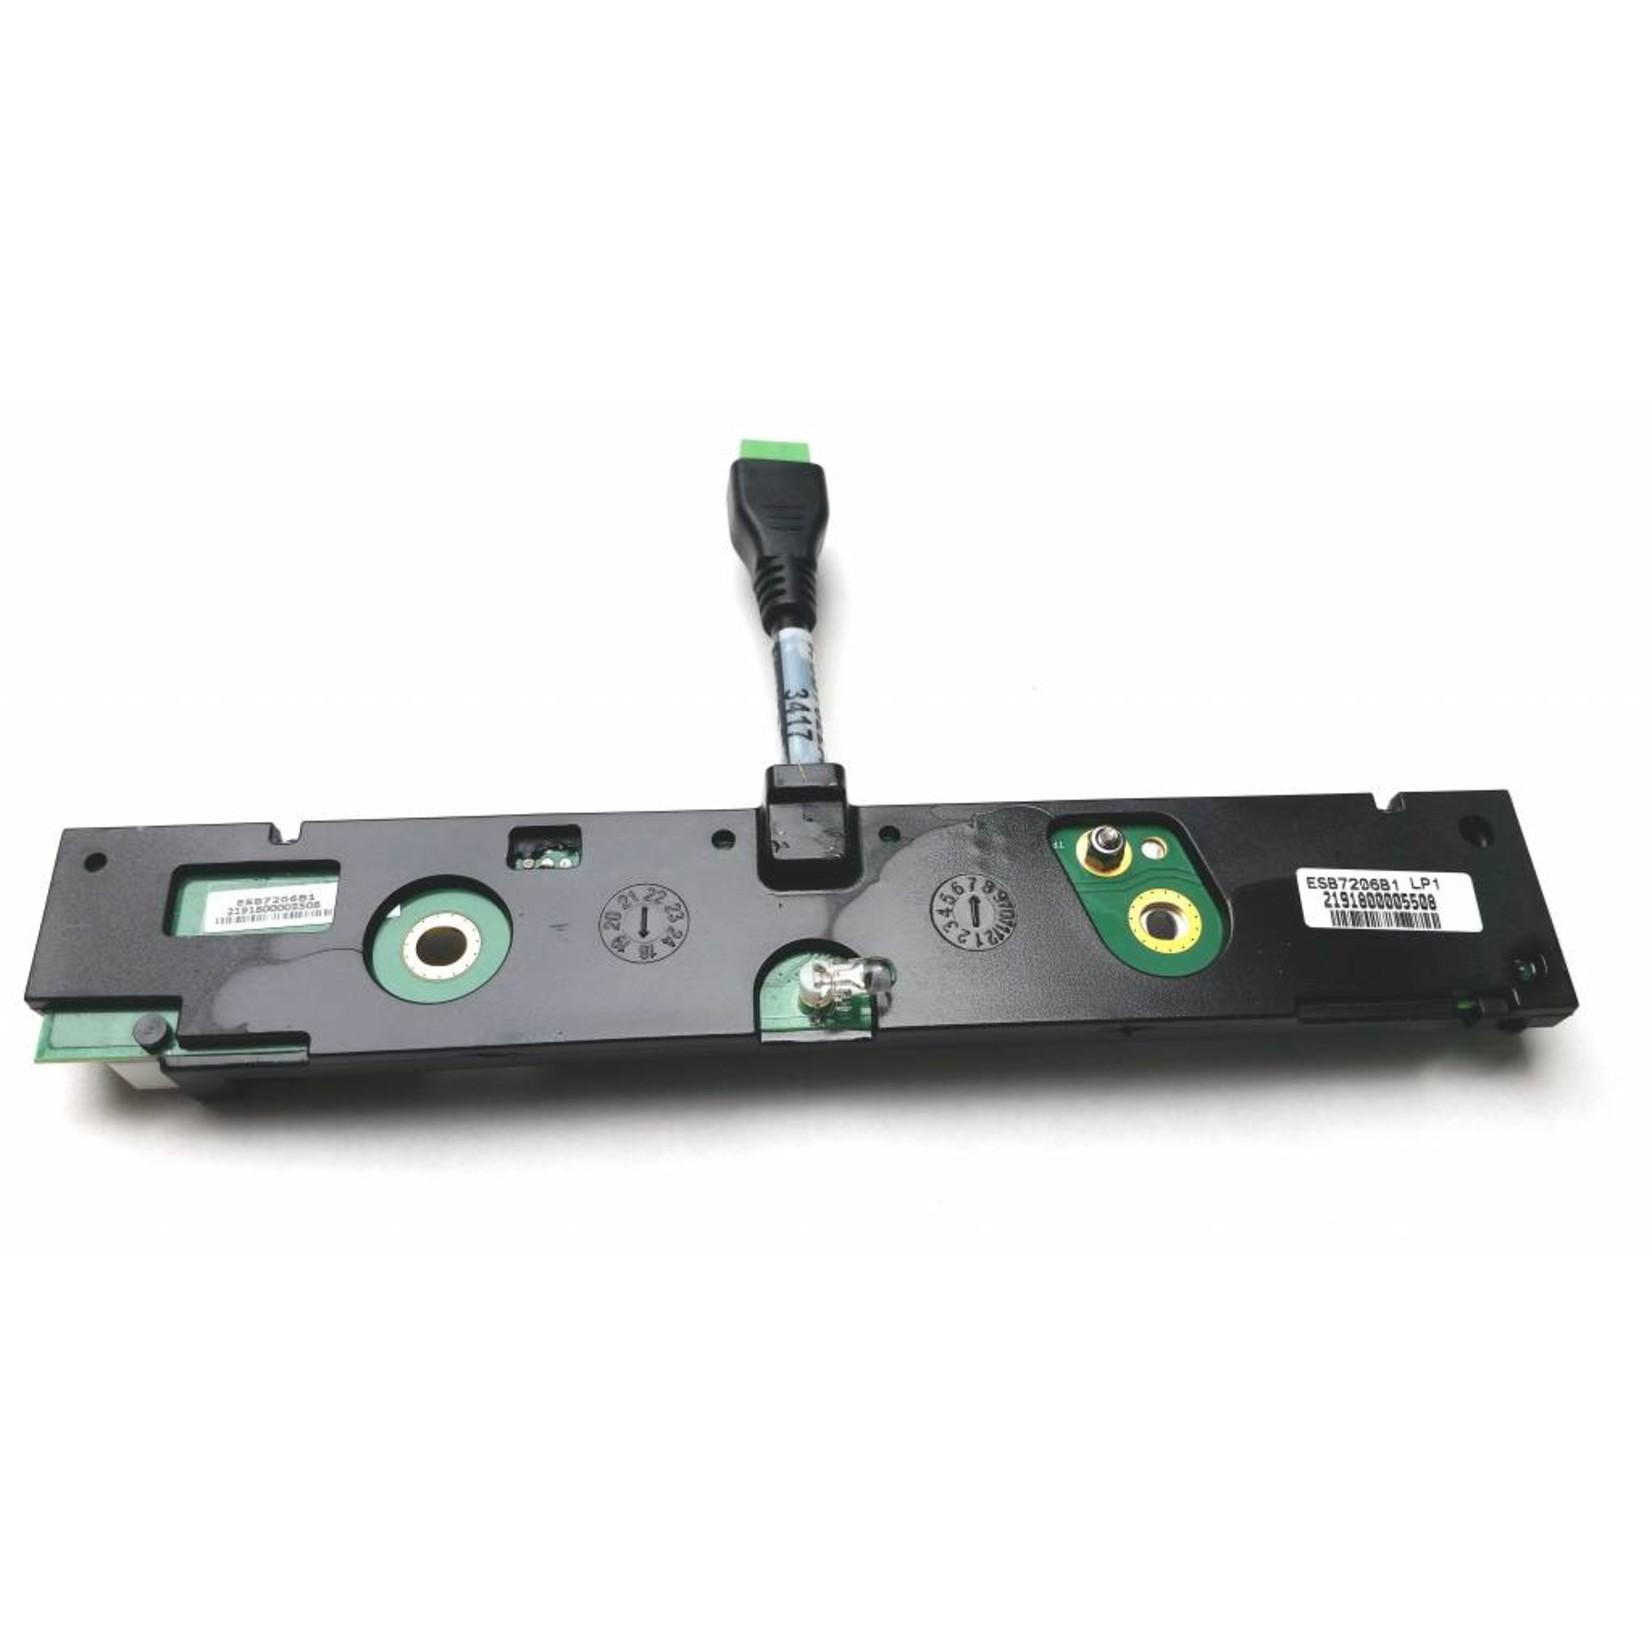 Robomow Robomow  Base Station Board Platine RC SPP7206A mit Bluetooth